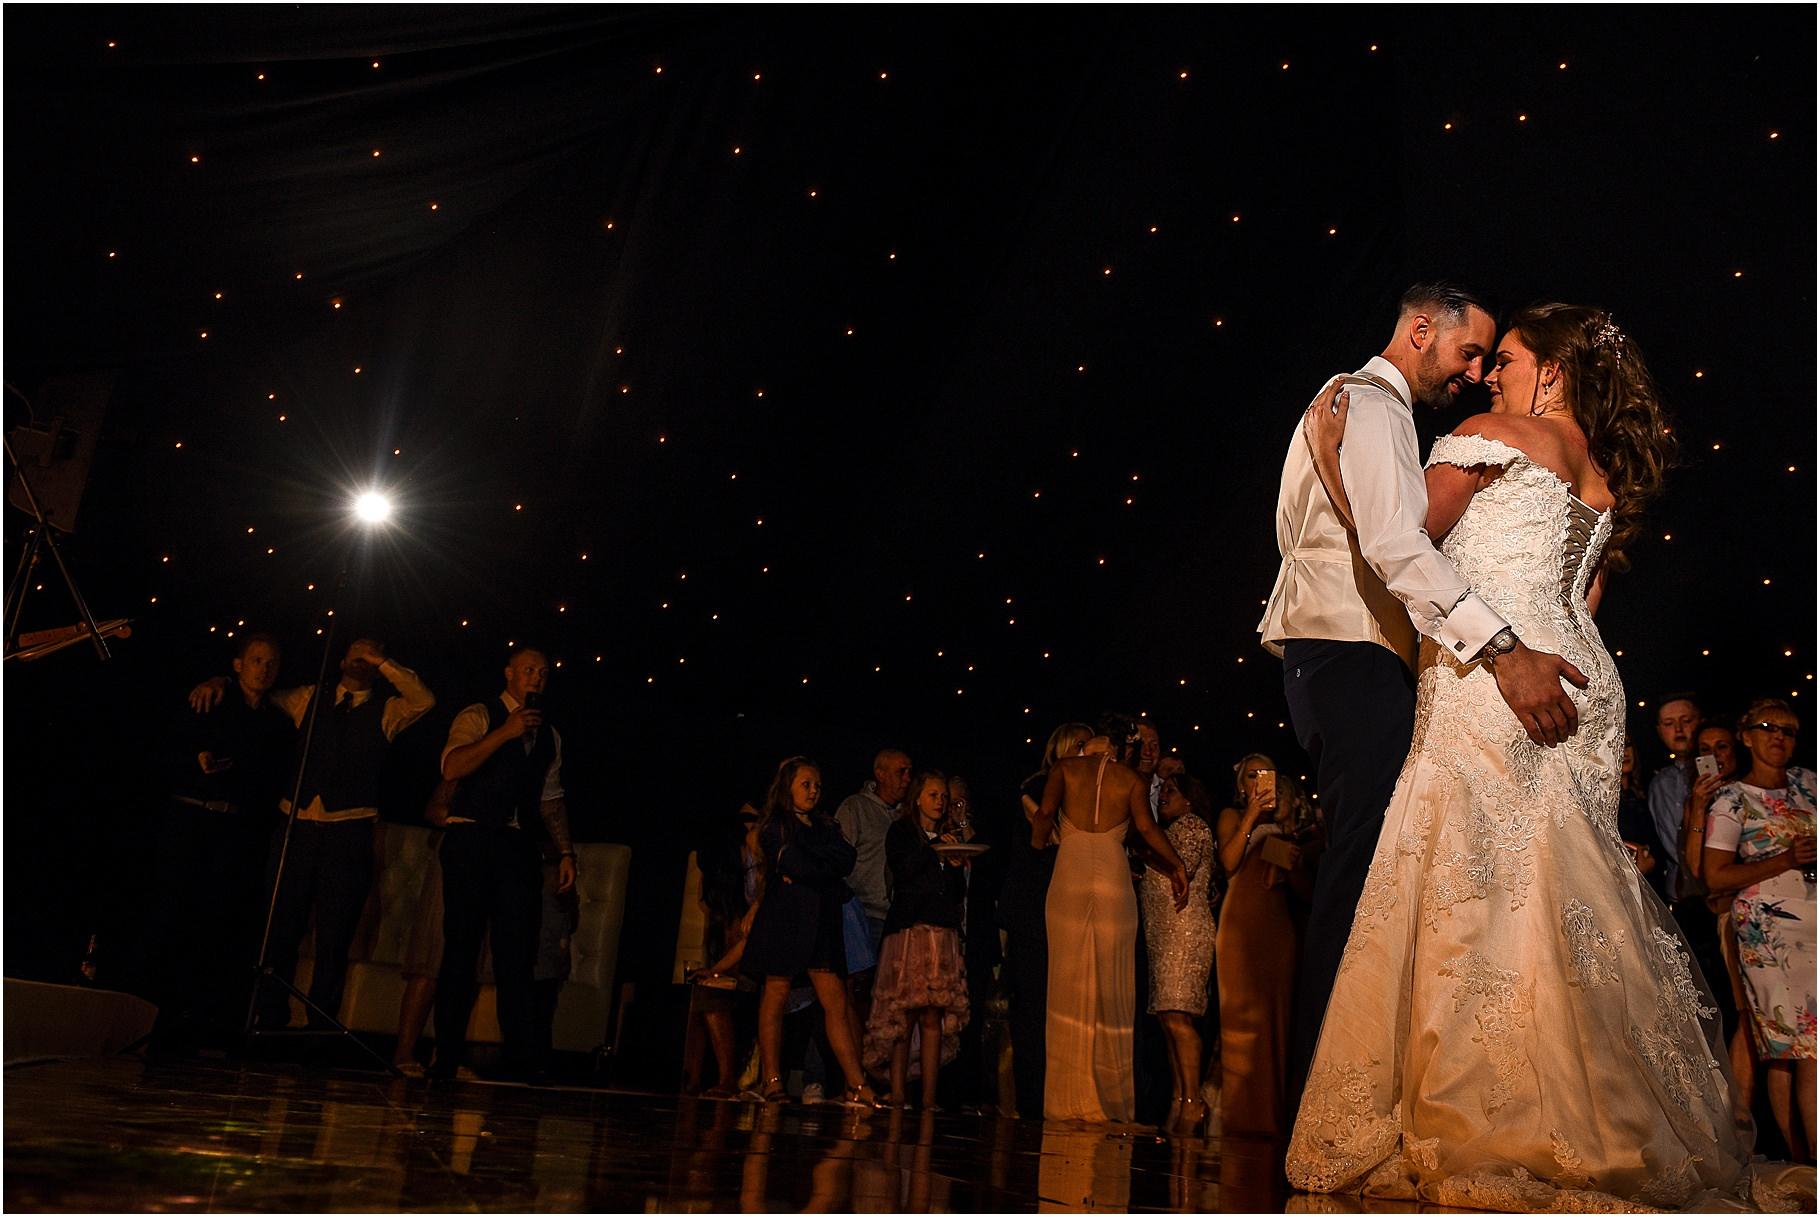 marquee-wedding-photography-122.jpg